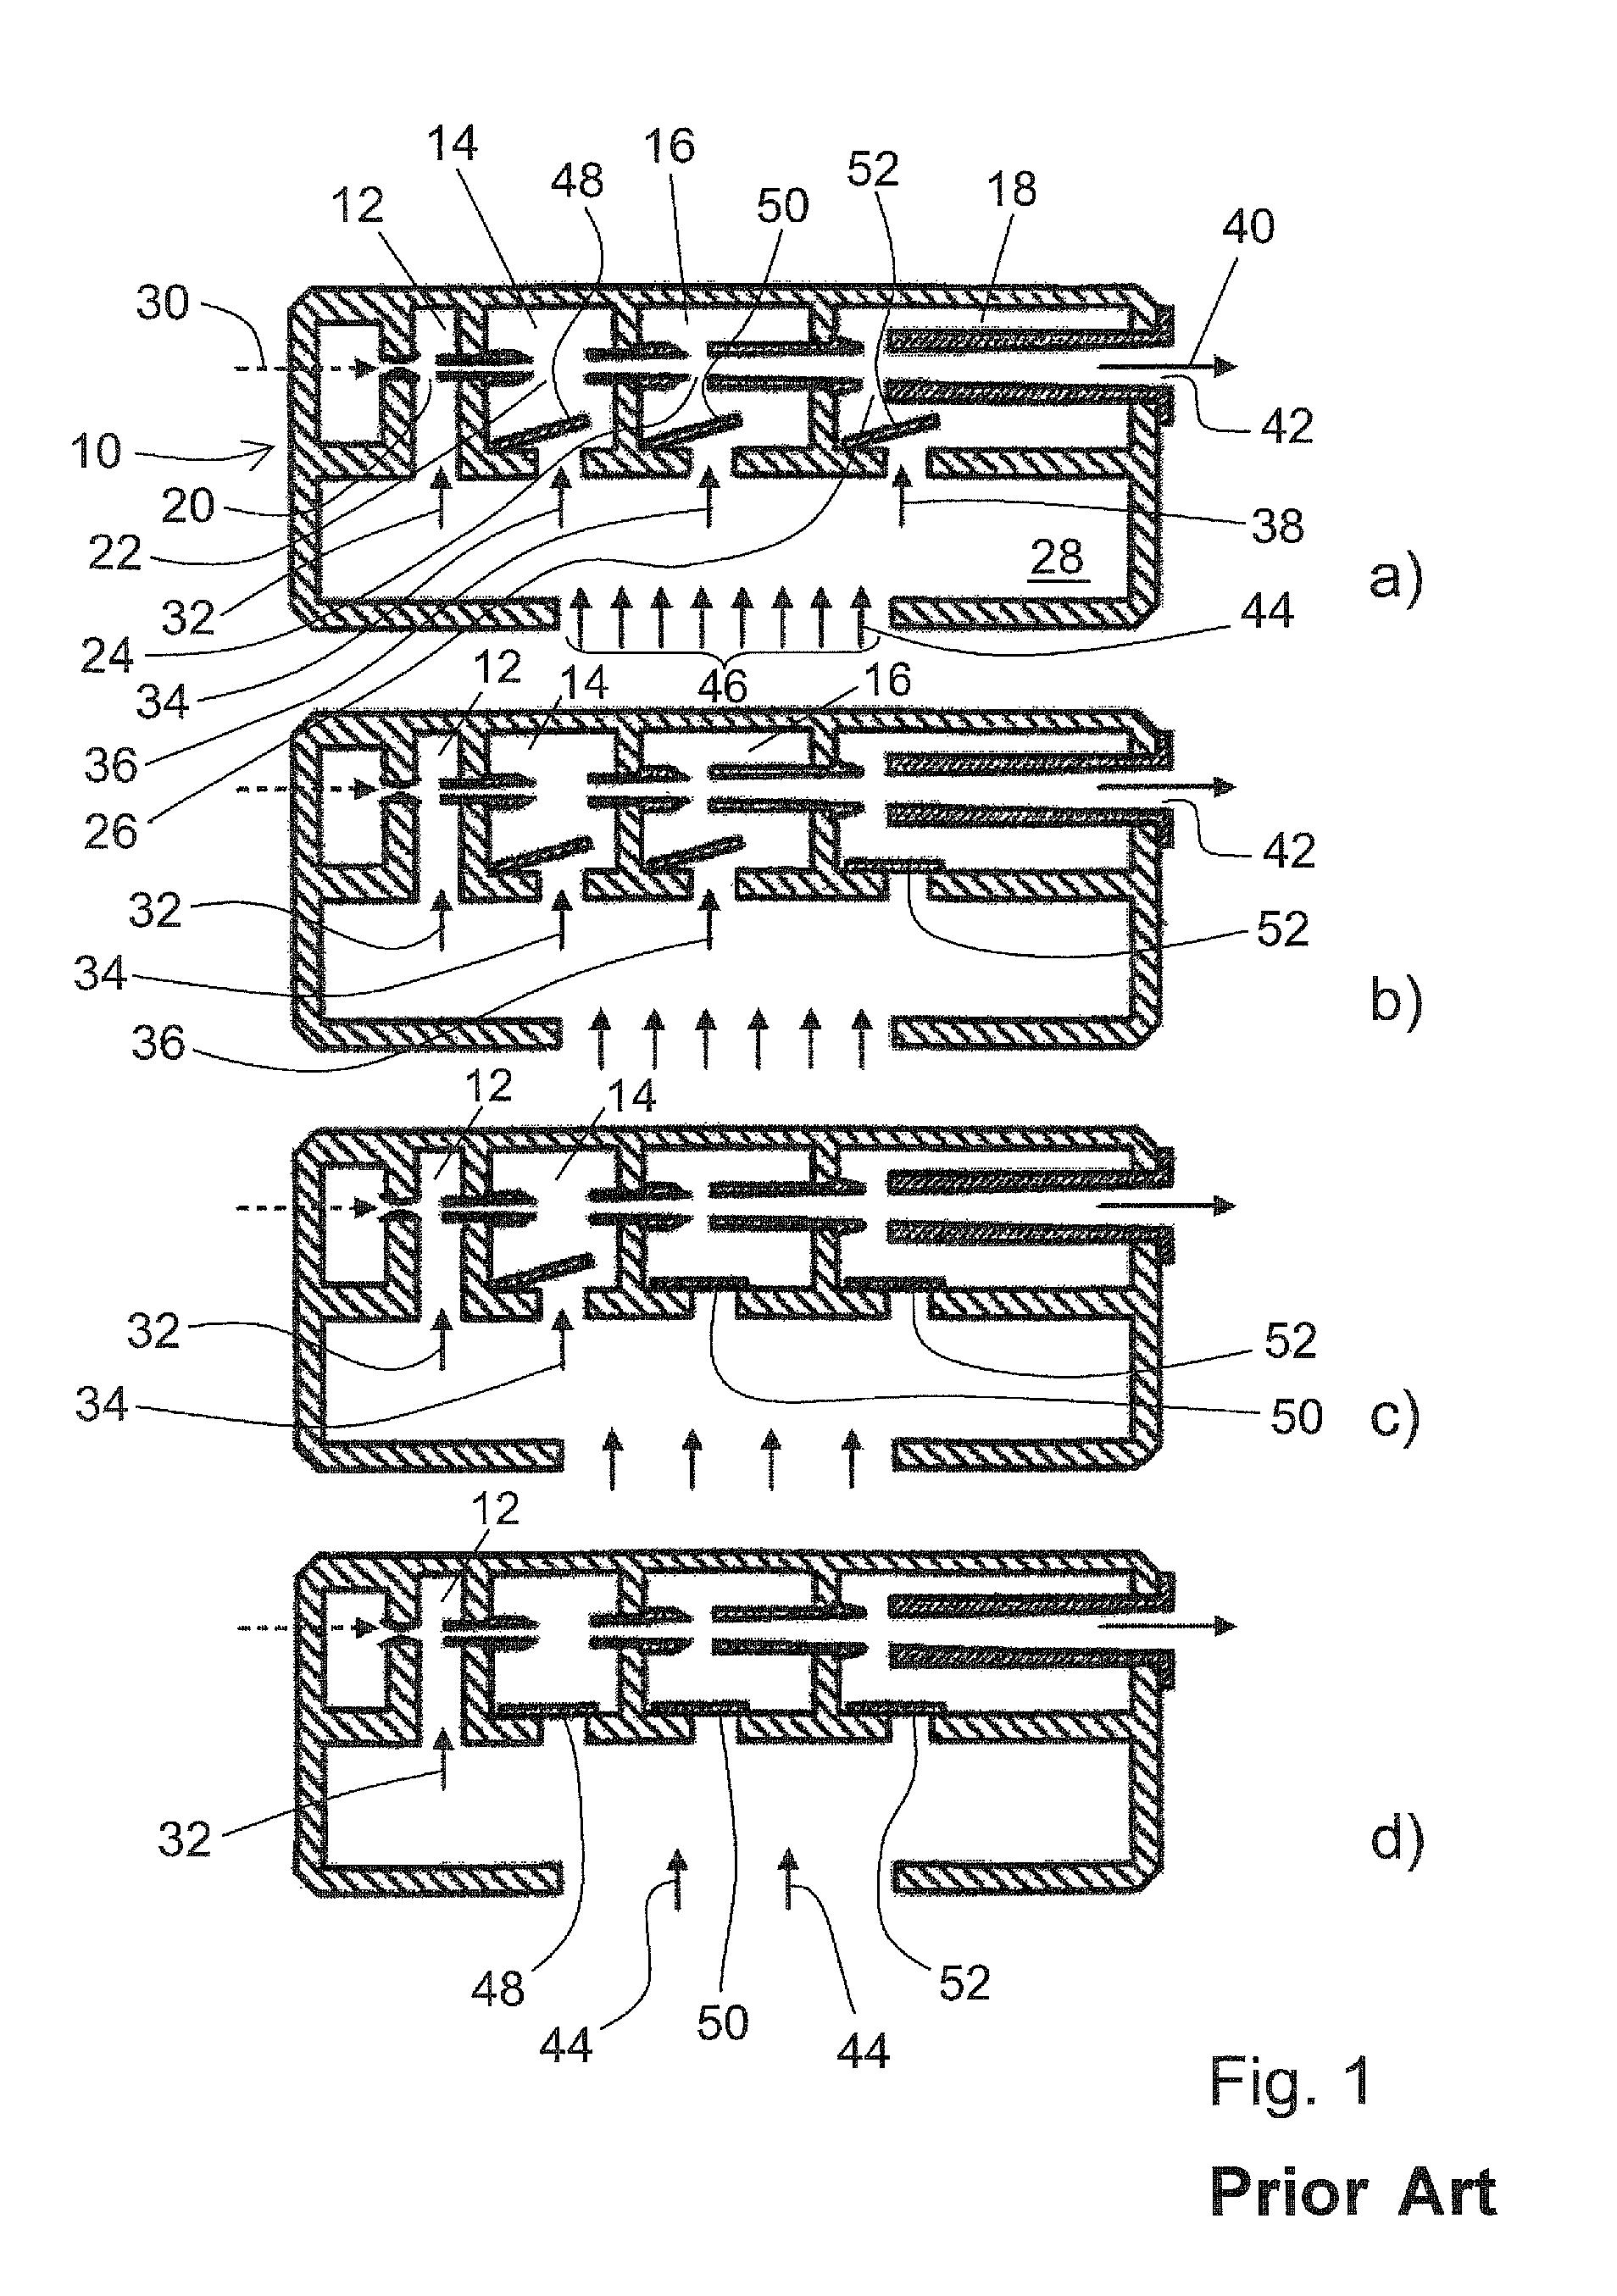 1979 mercedes 300d vacuum diagram